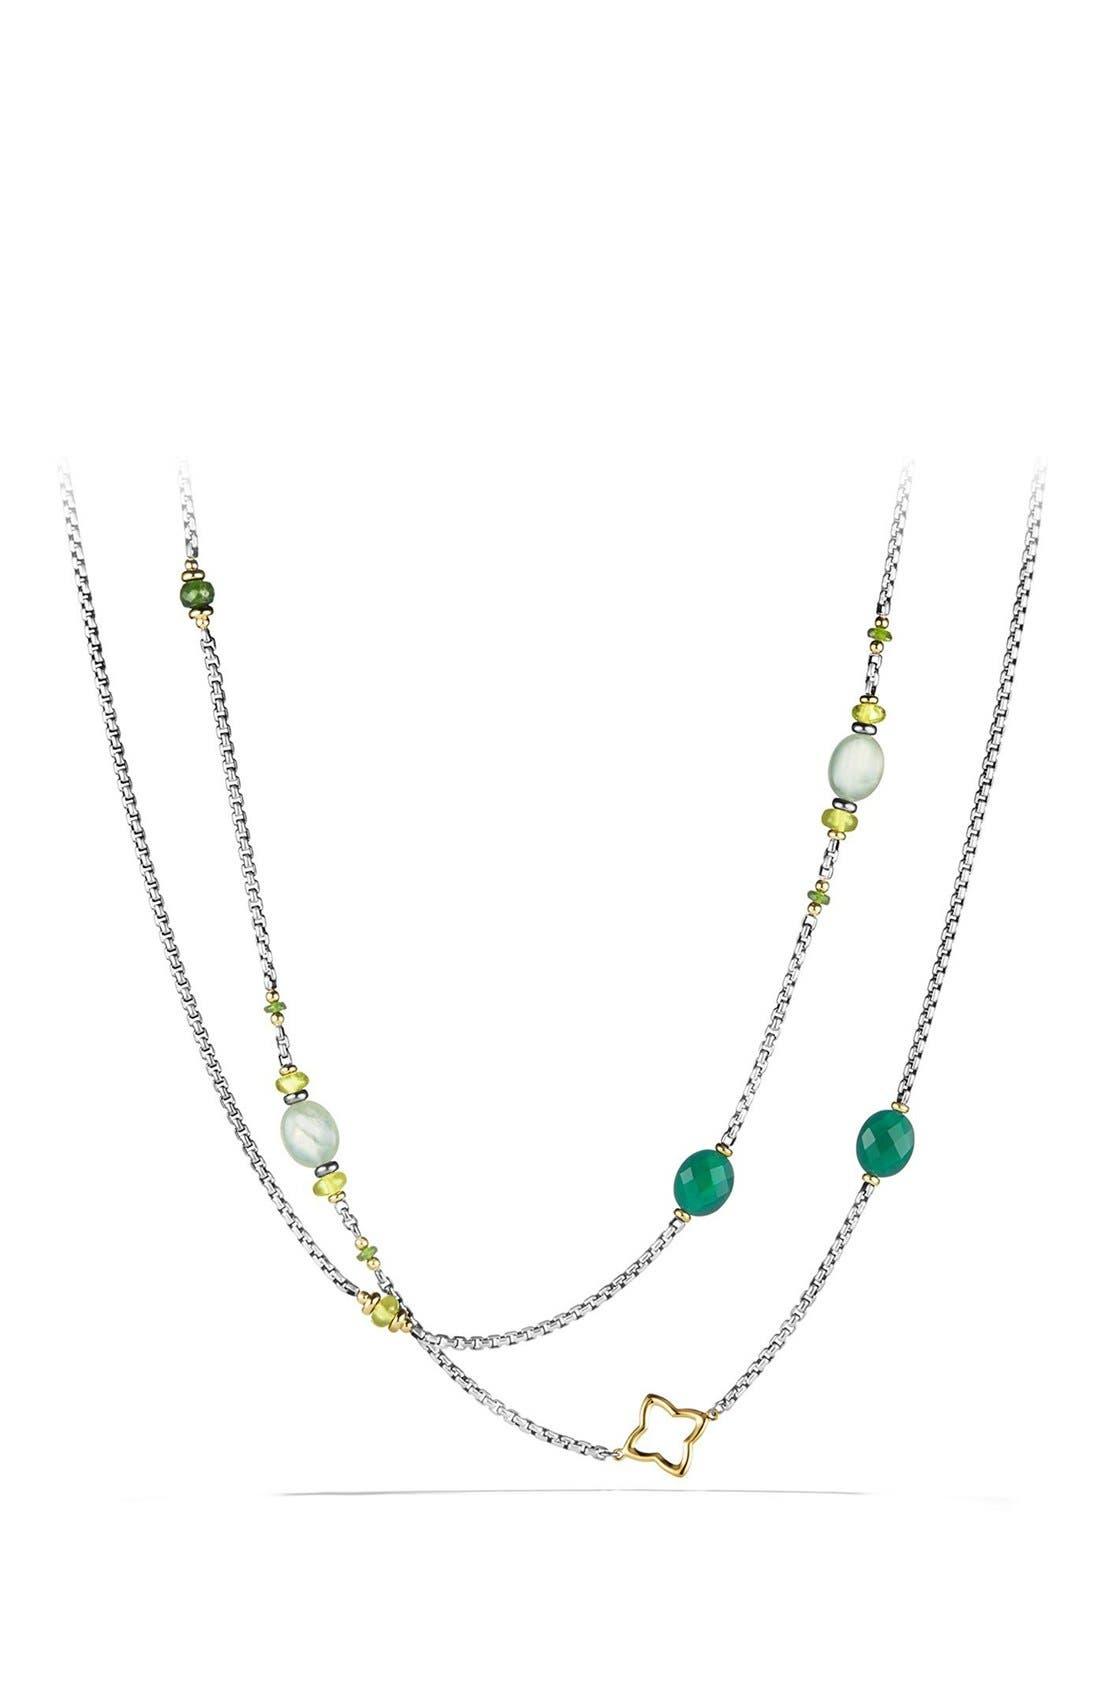 David Yurman 'Bead and Chain' Necklace